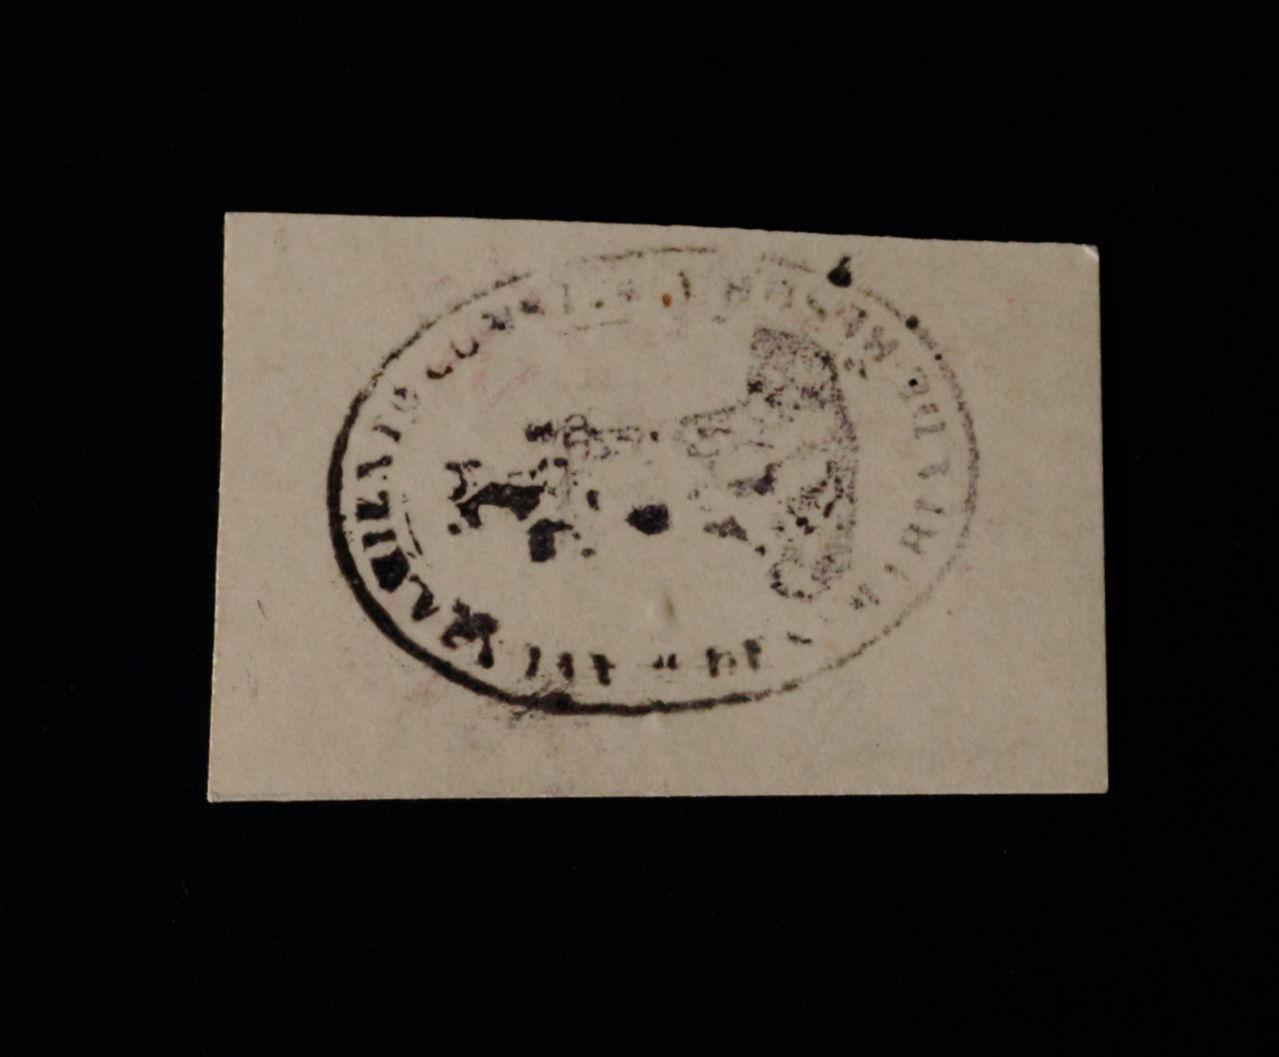 2 Rals Basora, 1937 IMG_2849